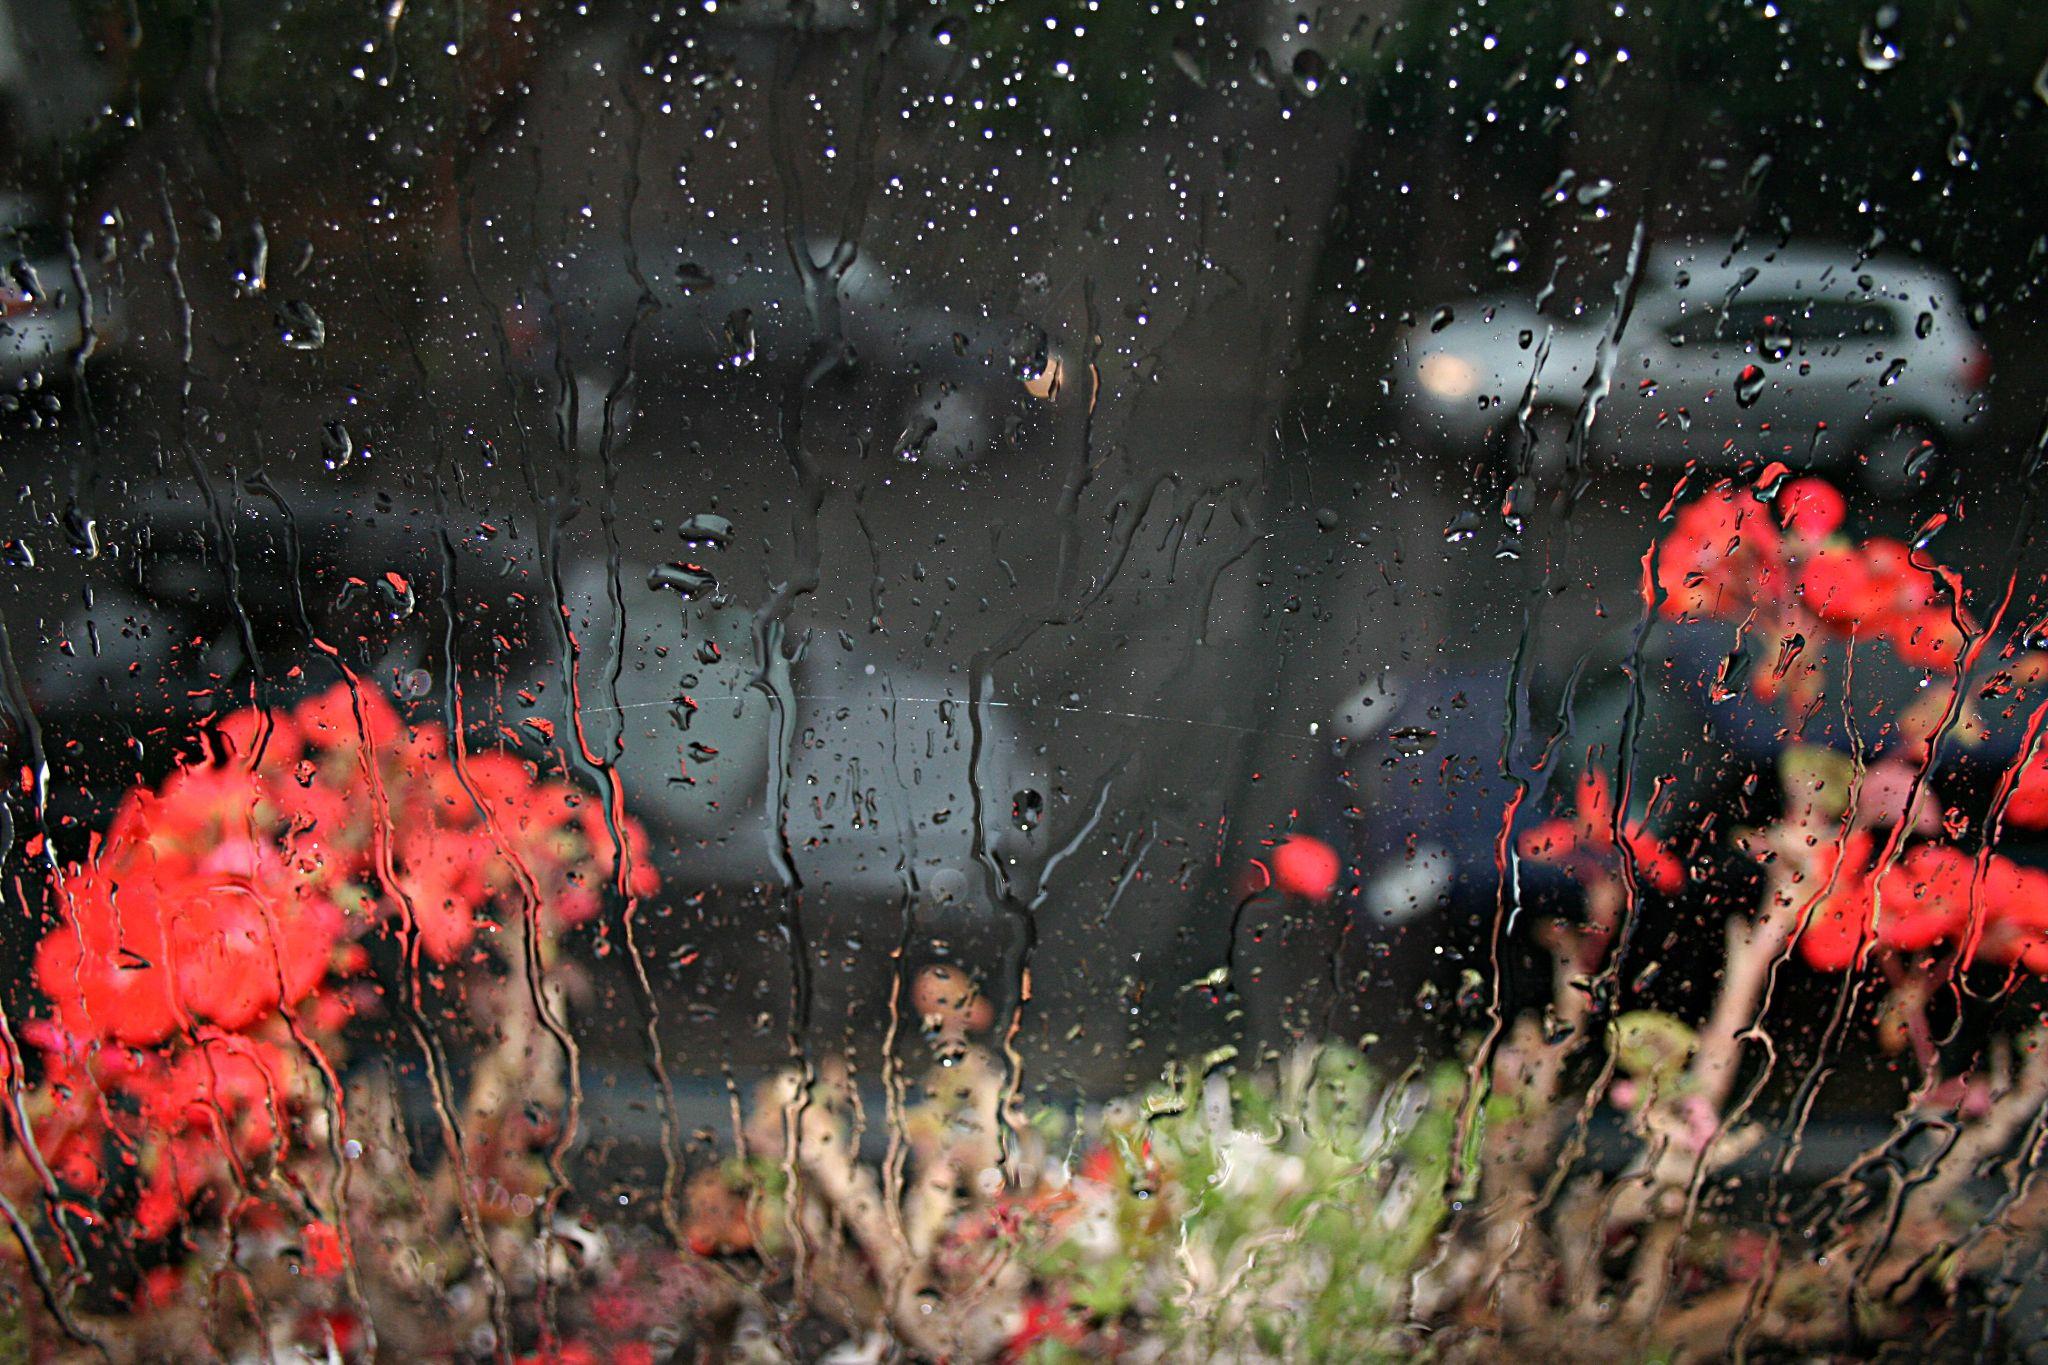 Rainy window by Ada N